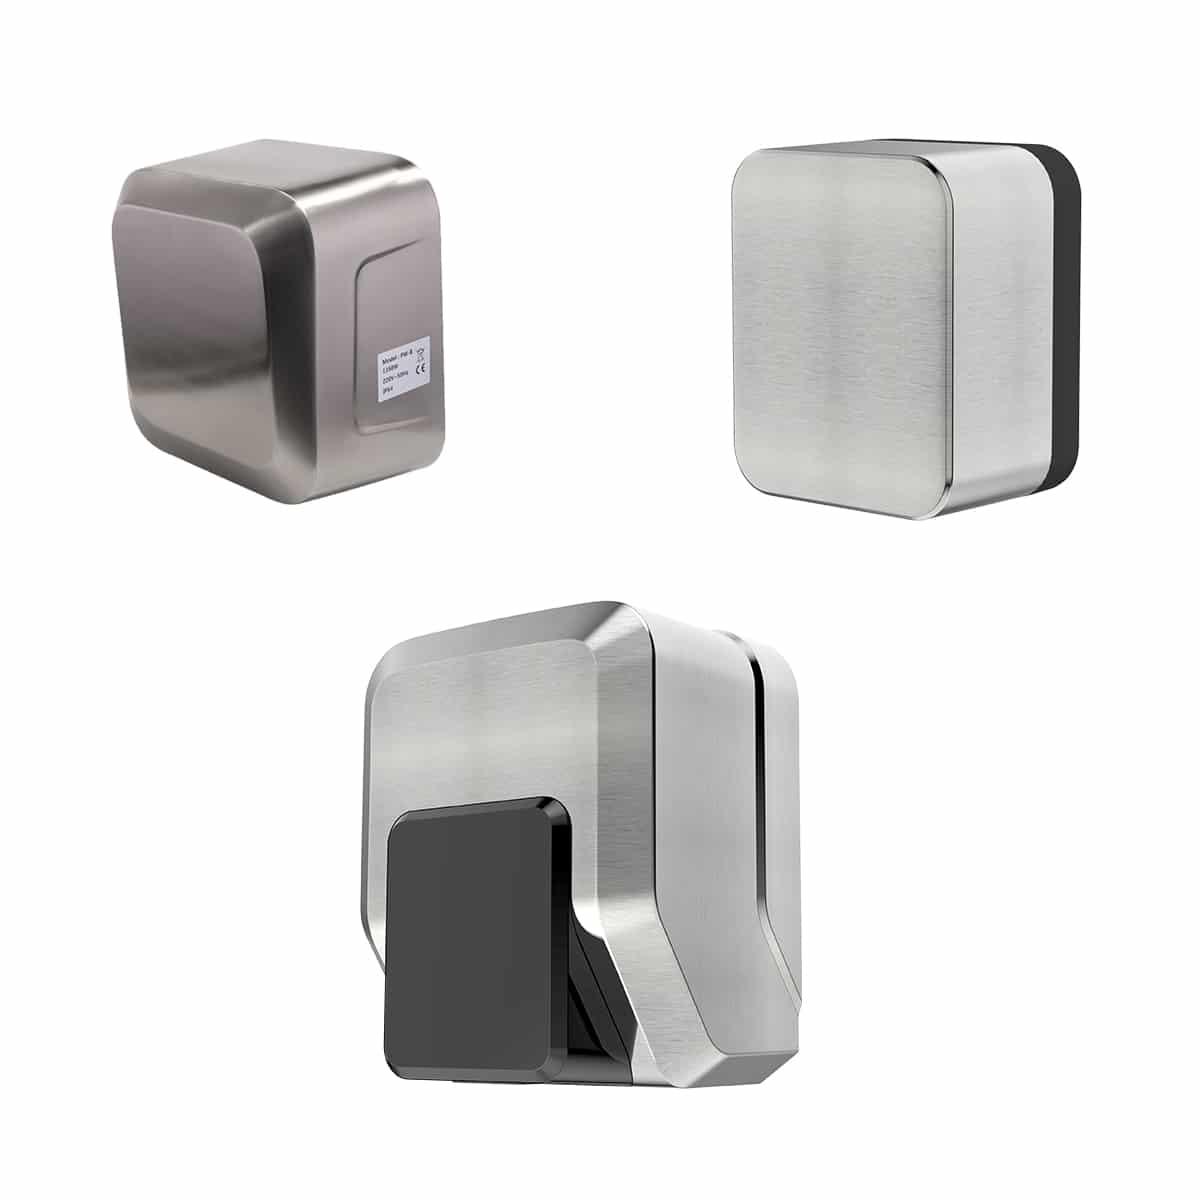 PW-A,B,C, single side jet Hand dryer